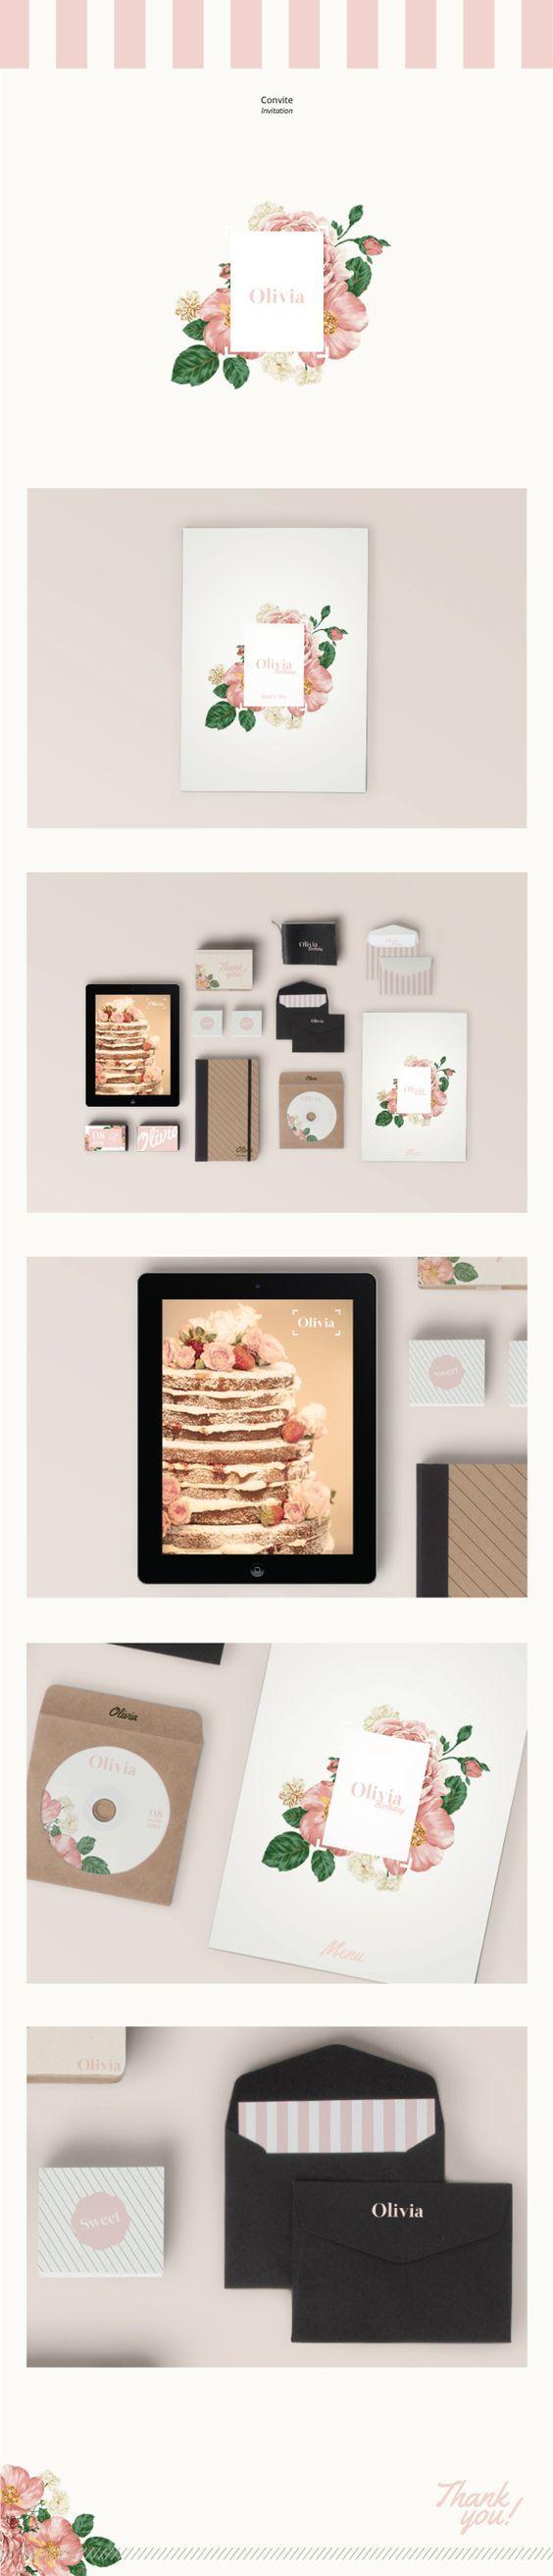 Convite | Invitation | OLIVIA by Cristiane Amaral, via Behance pretty #identity #packaging #branding PD: